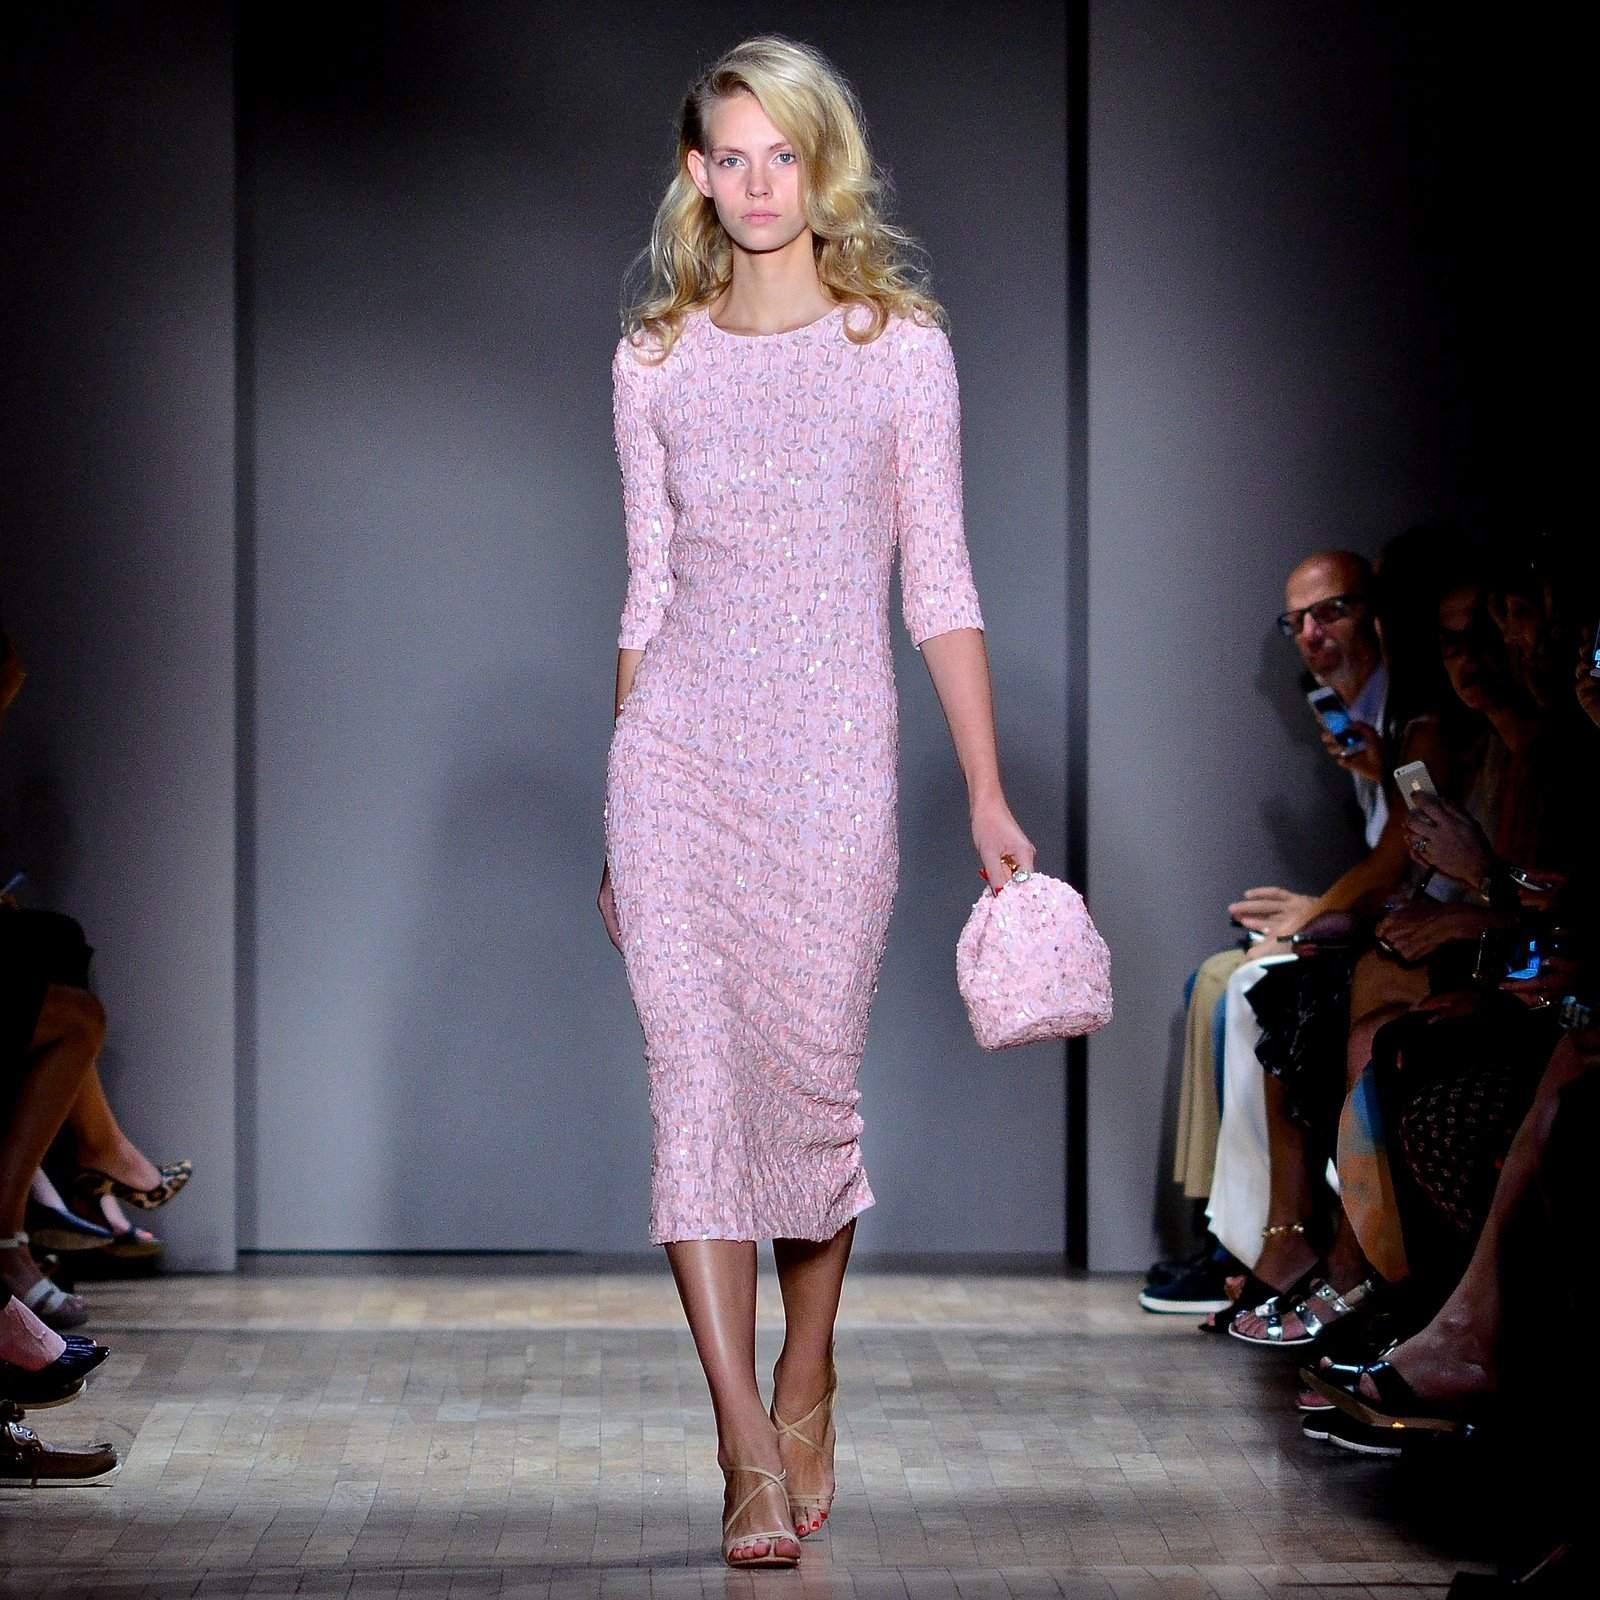 jenny packham1 Jenny Packham Spring/Summer Collection 2015 at NYC Fashion Week